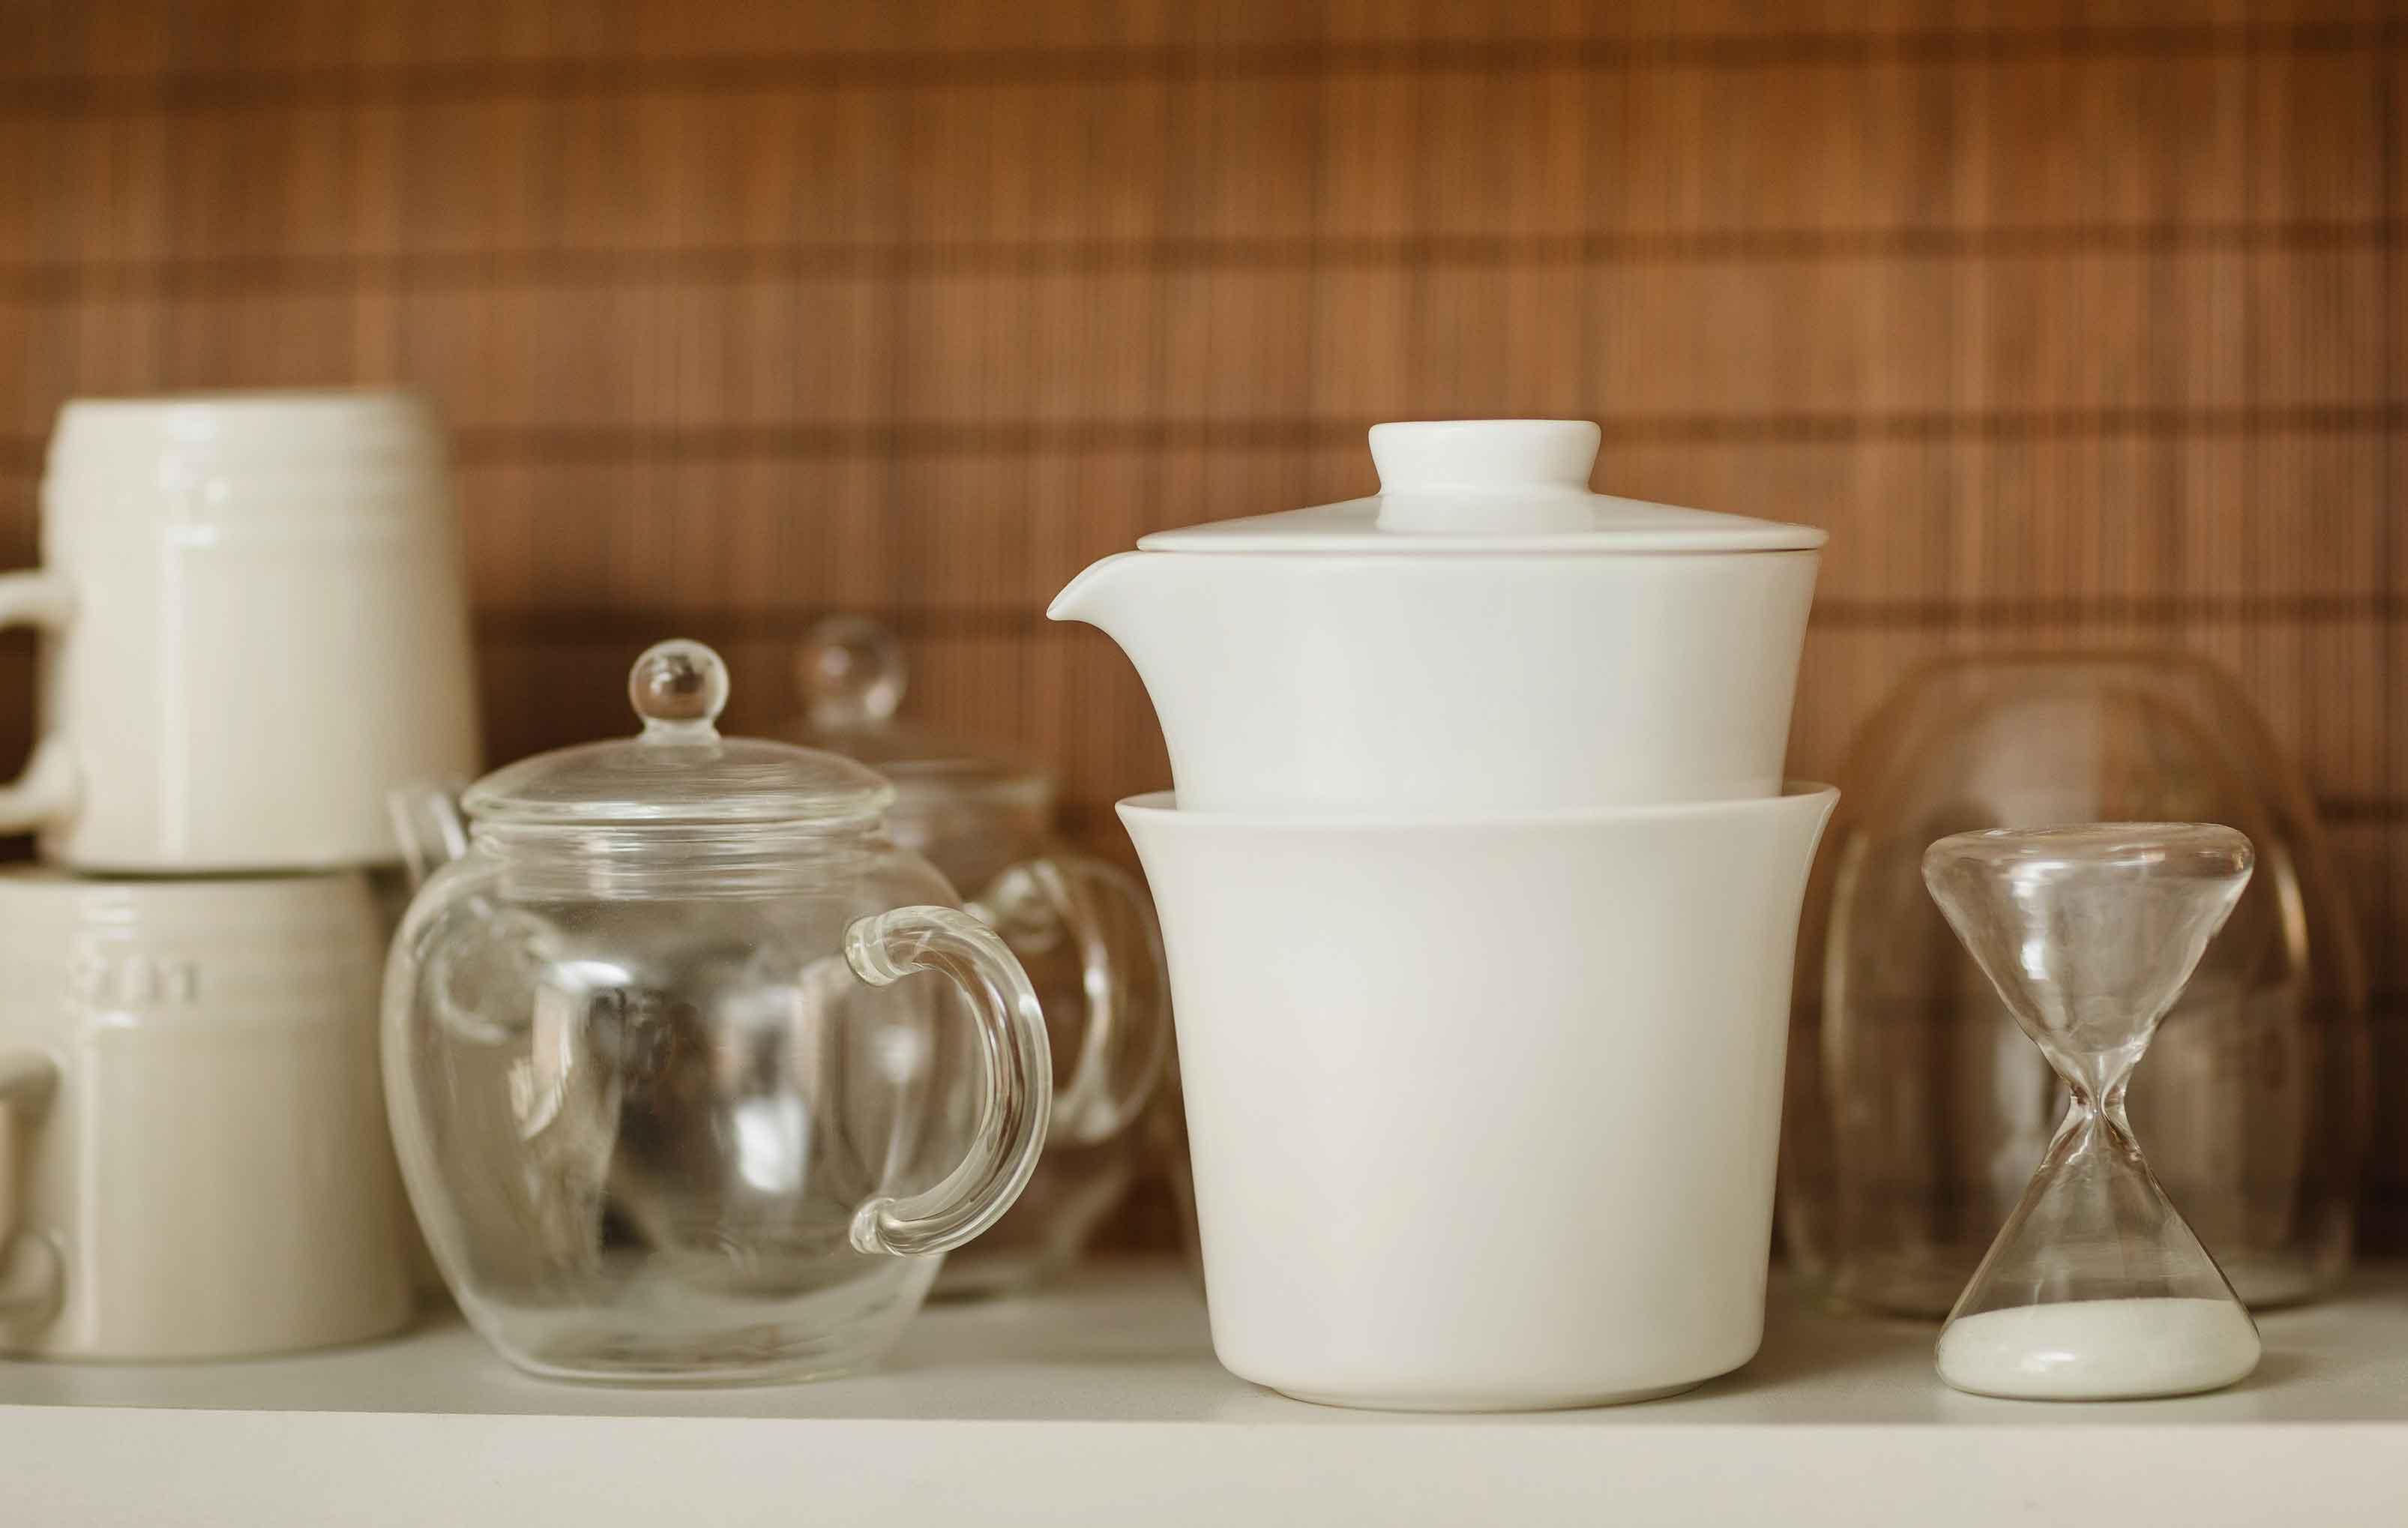 Assorted JING Teaware on a Shelf